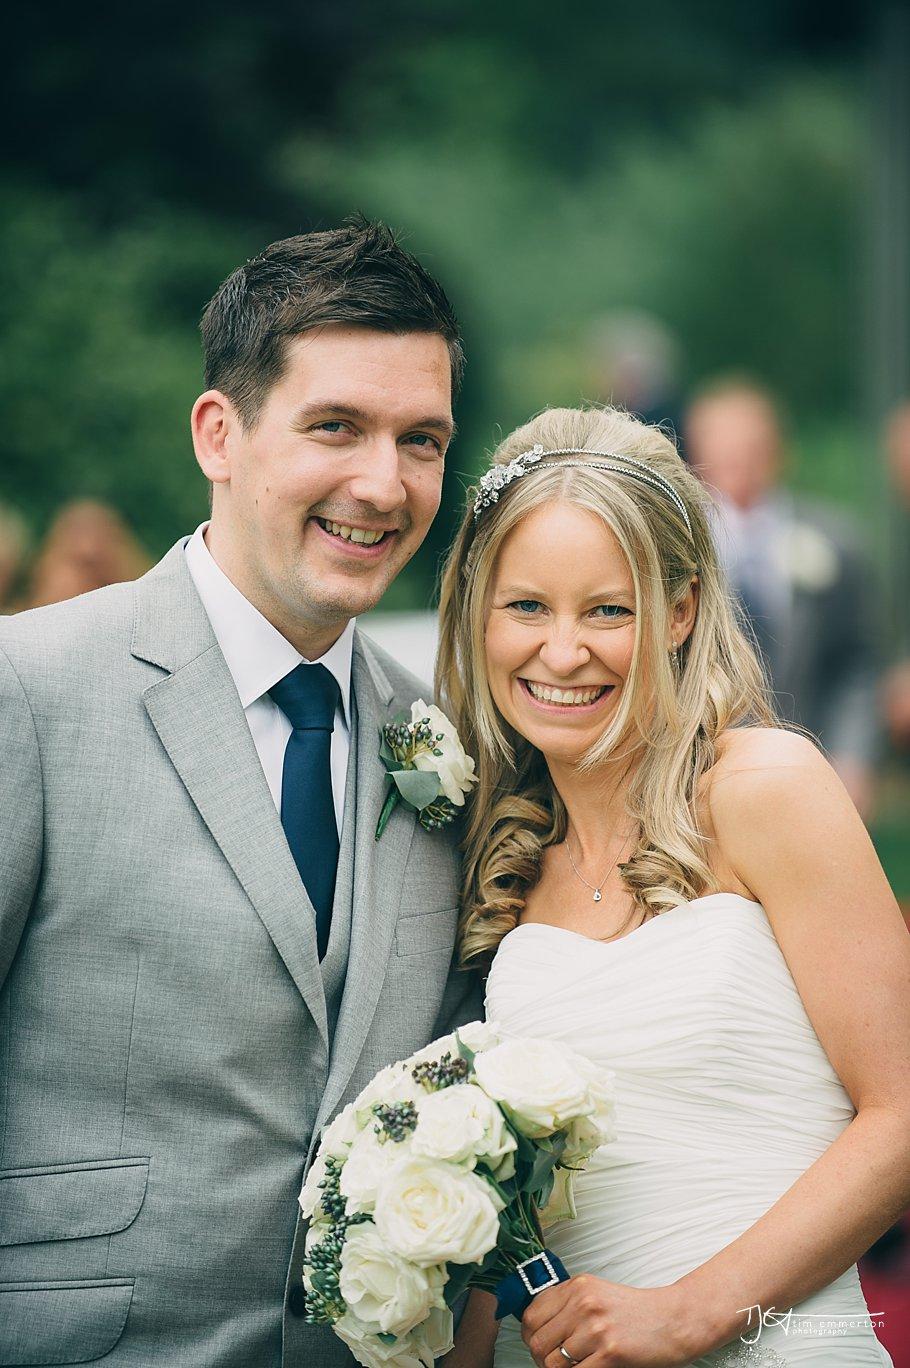 Wedding-Photographer-Fanhams-Hall-Hotel-Hertfordshire-068.jpg